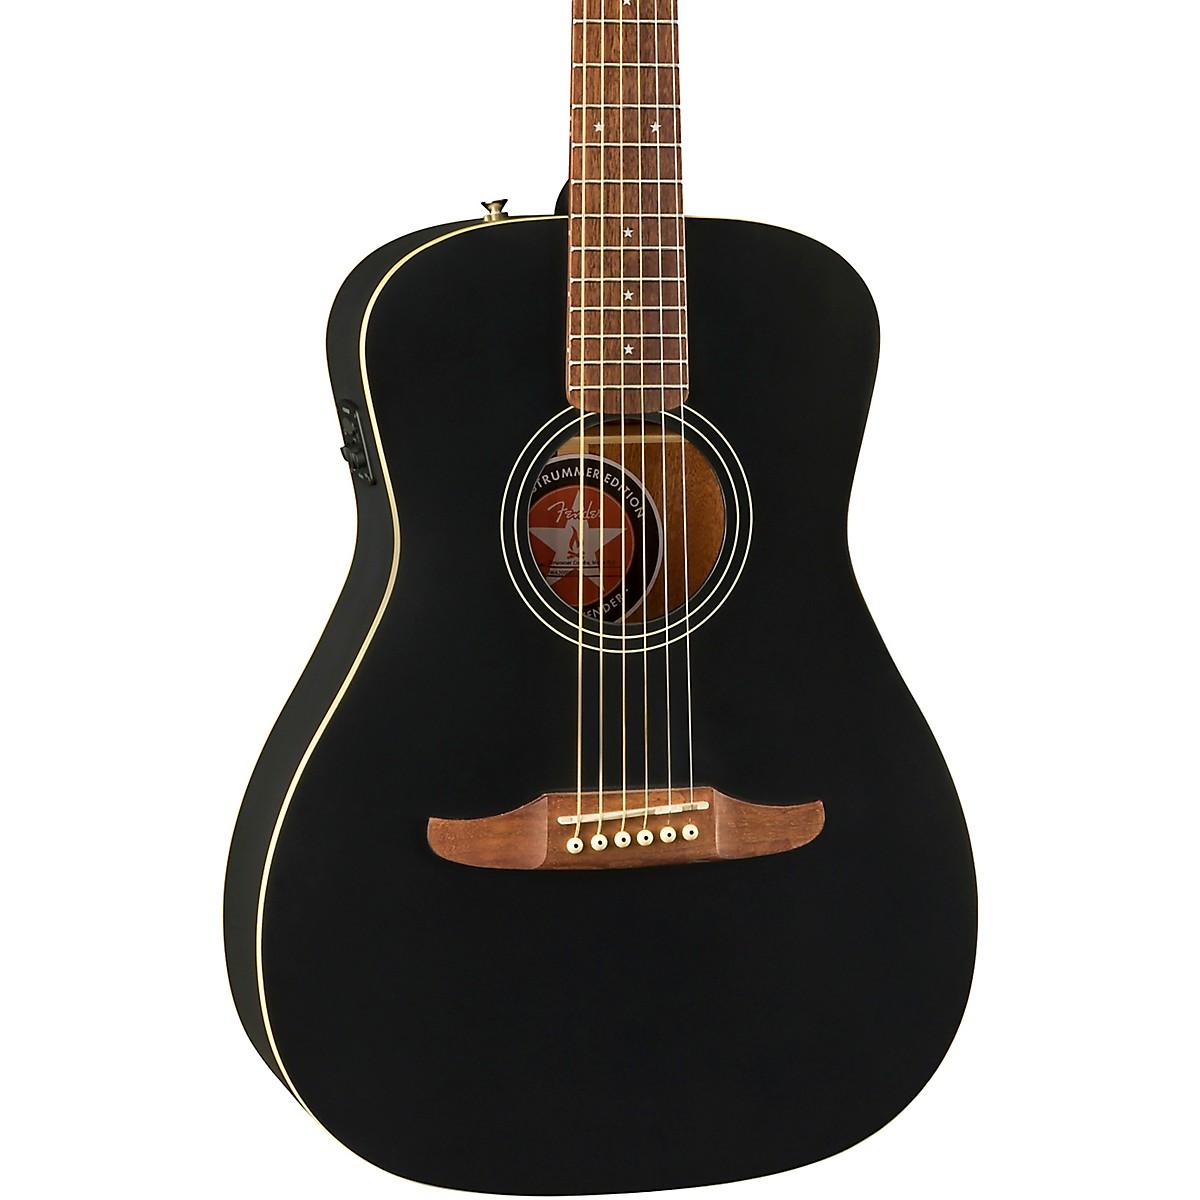 Fender Joe Strummer Campfire Acoustic-Electric Guitar